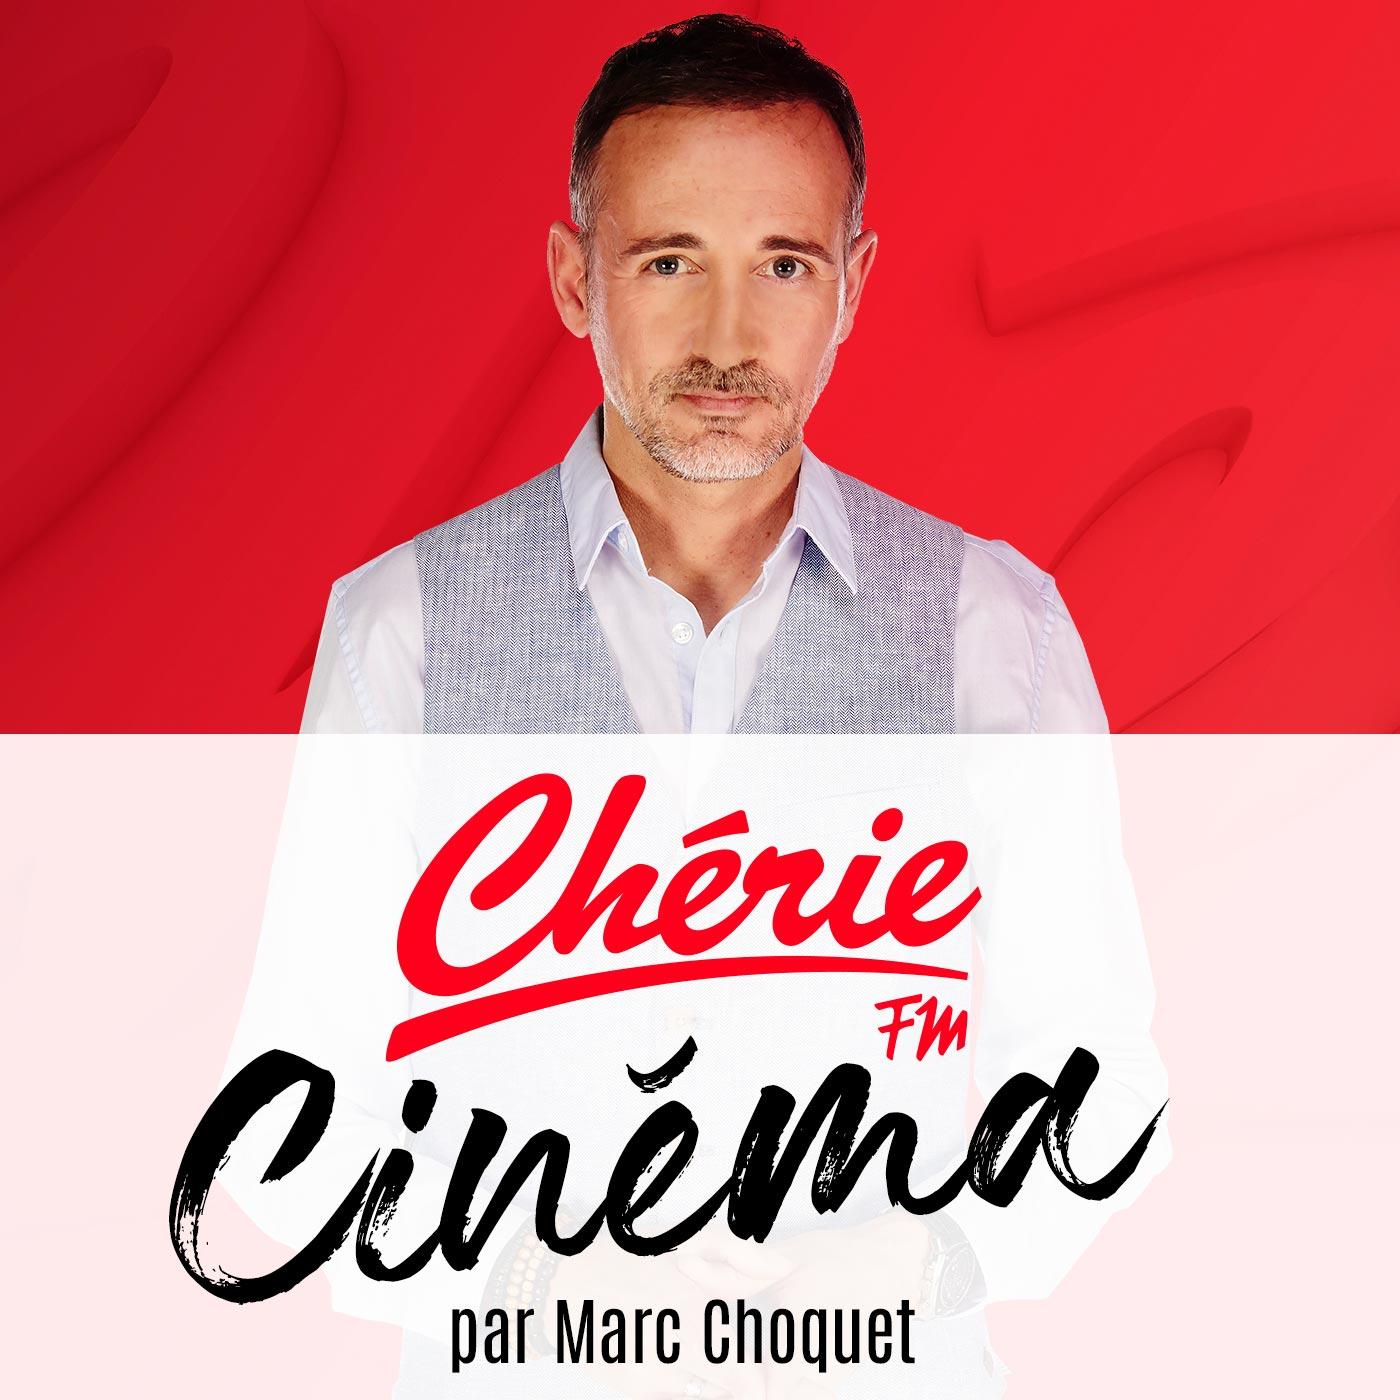 Image 1: Cherie FM Cinema